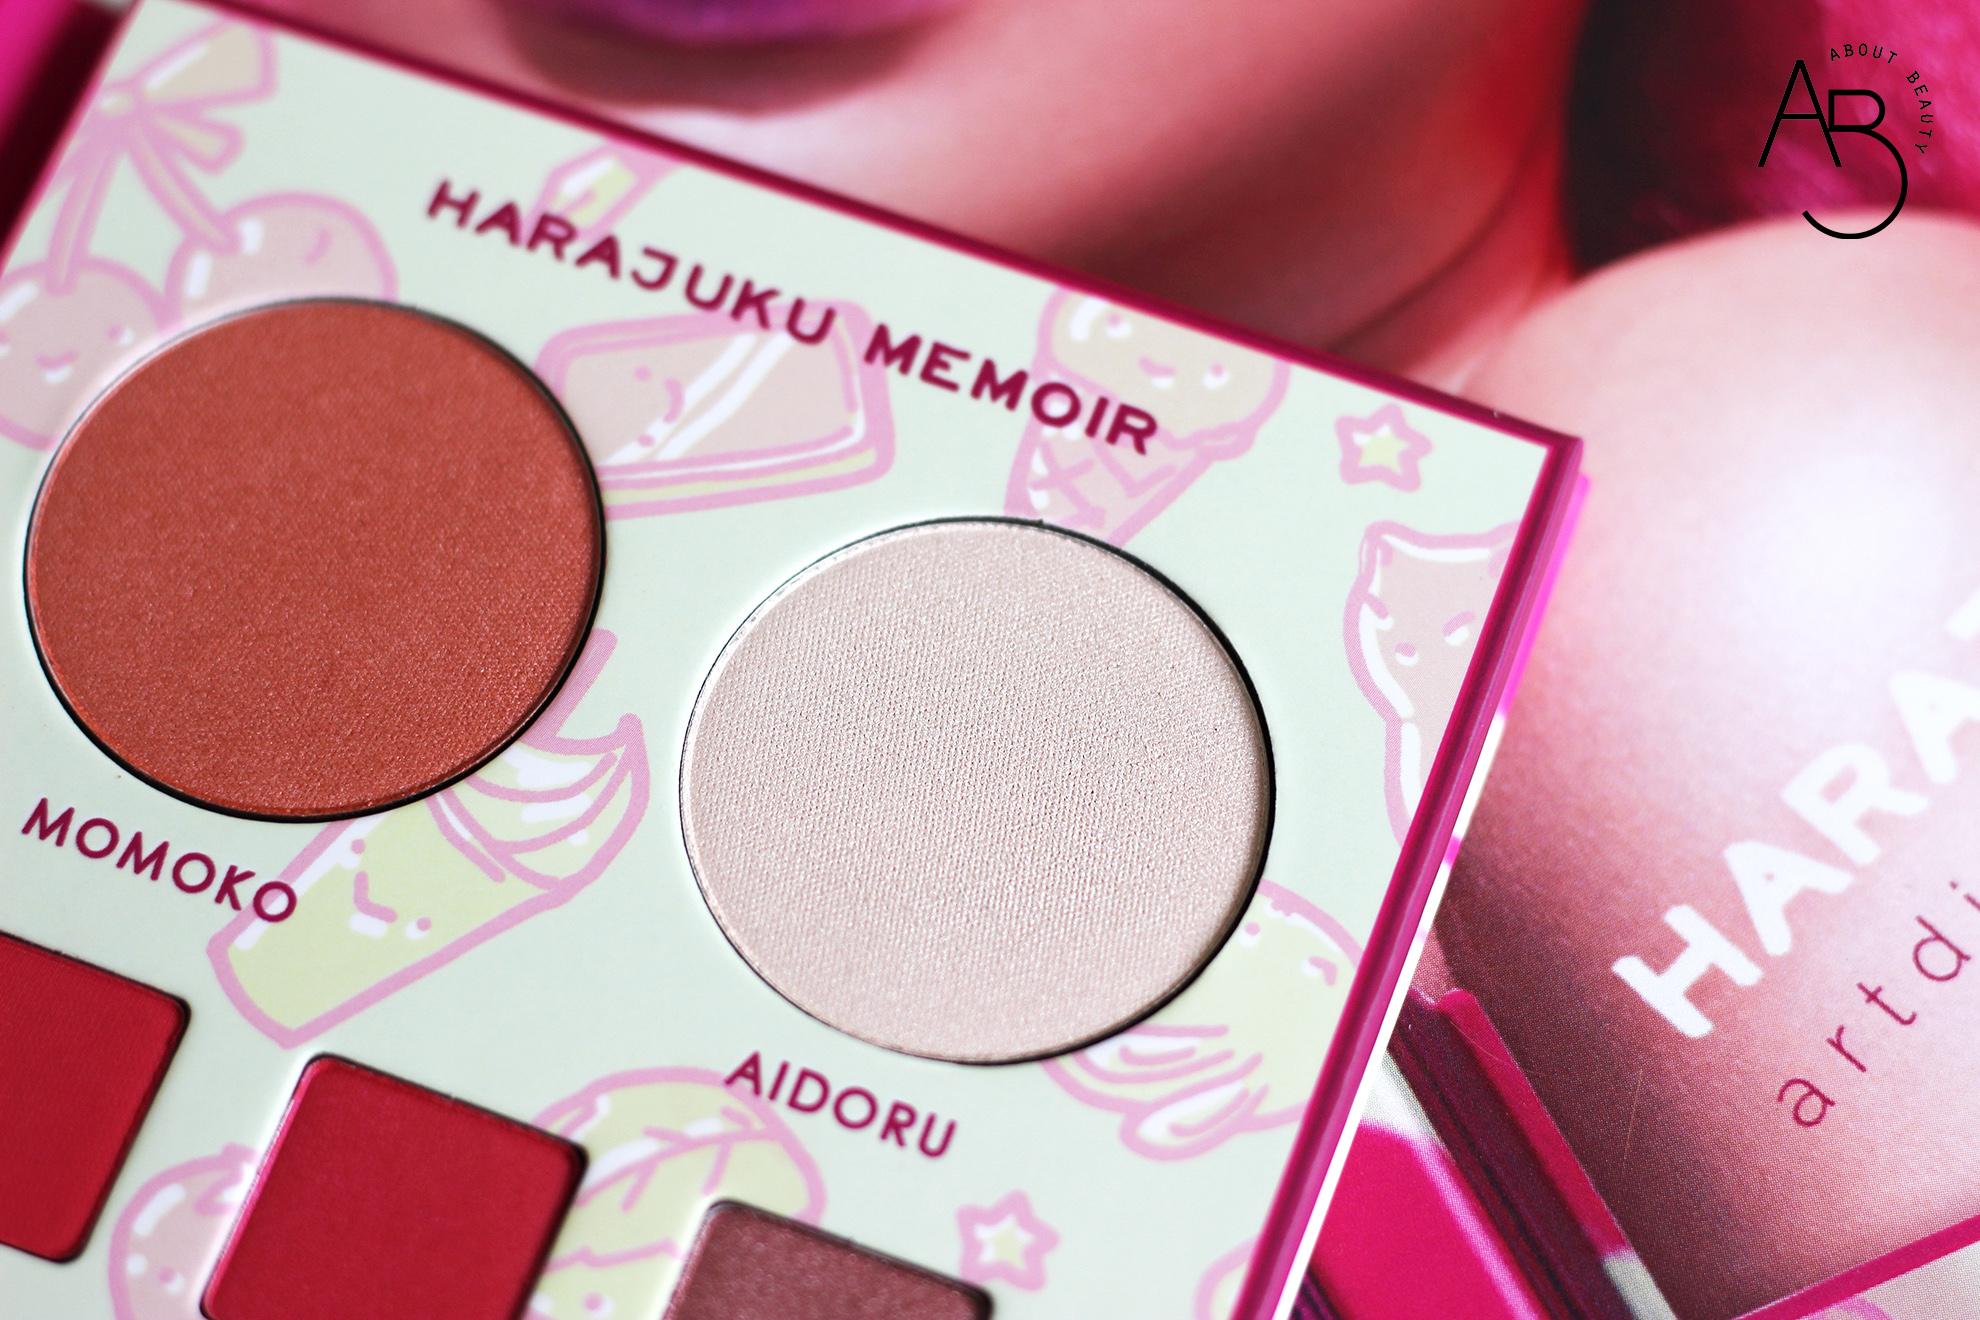 neve cosmetics harajuku memoir palette ombretti eyeshadow - info recensione swatch inci opinioni review tutorial codice sconto - aidoru